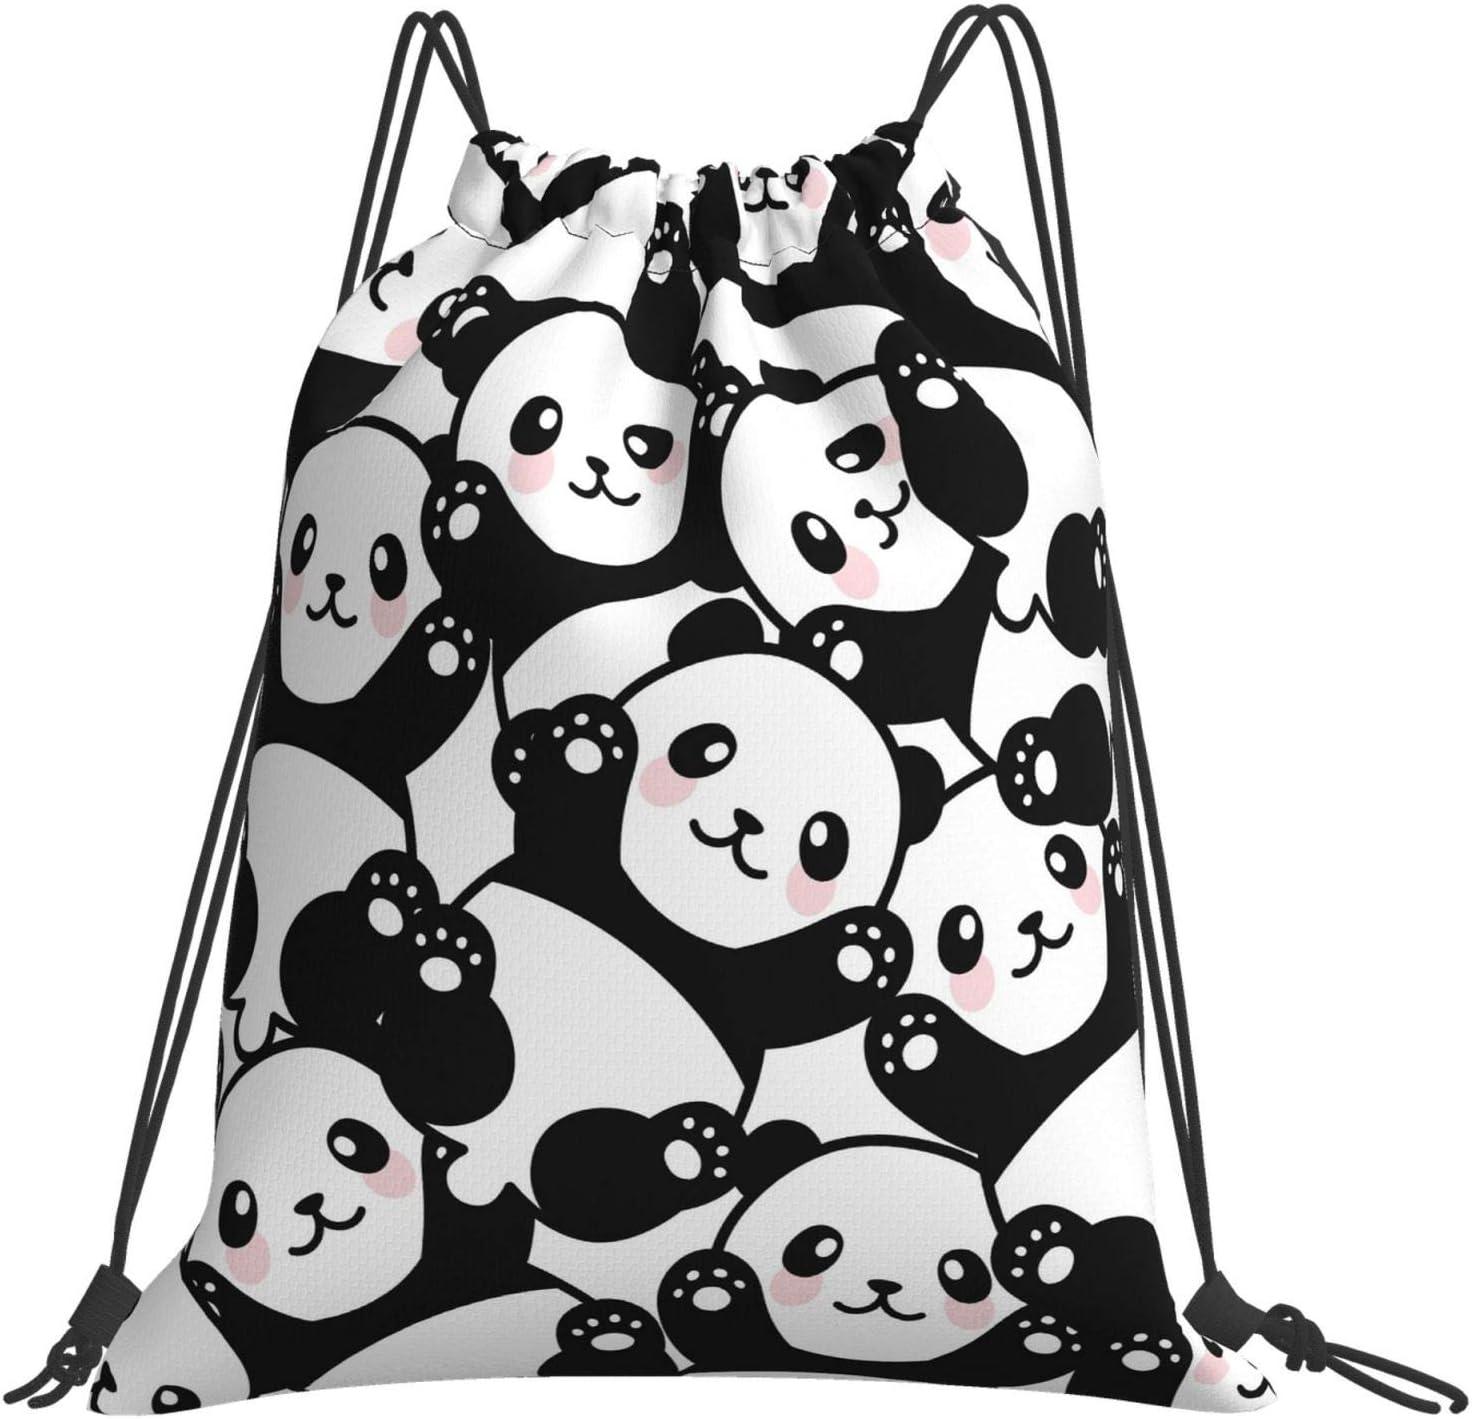 Cute Bombing free shipping Cartoon Panda Drawstring Backpack Las Vegas Mall Lightweight Waterproof St